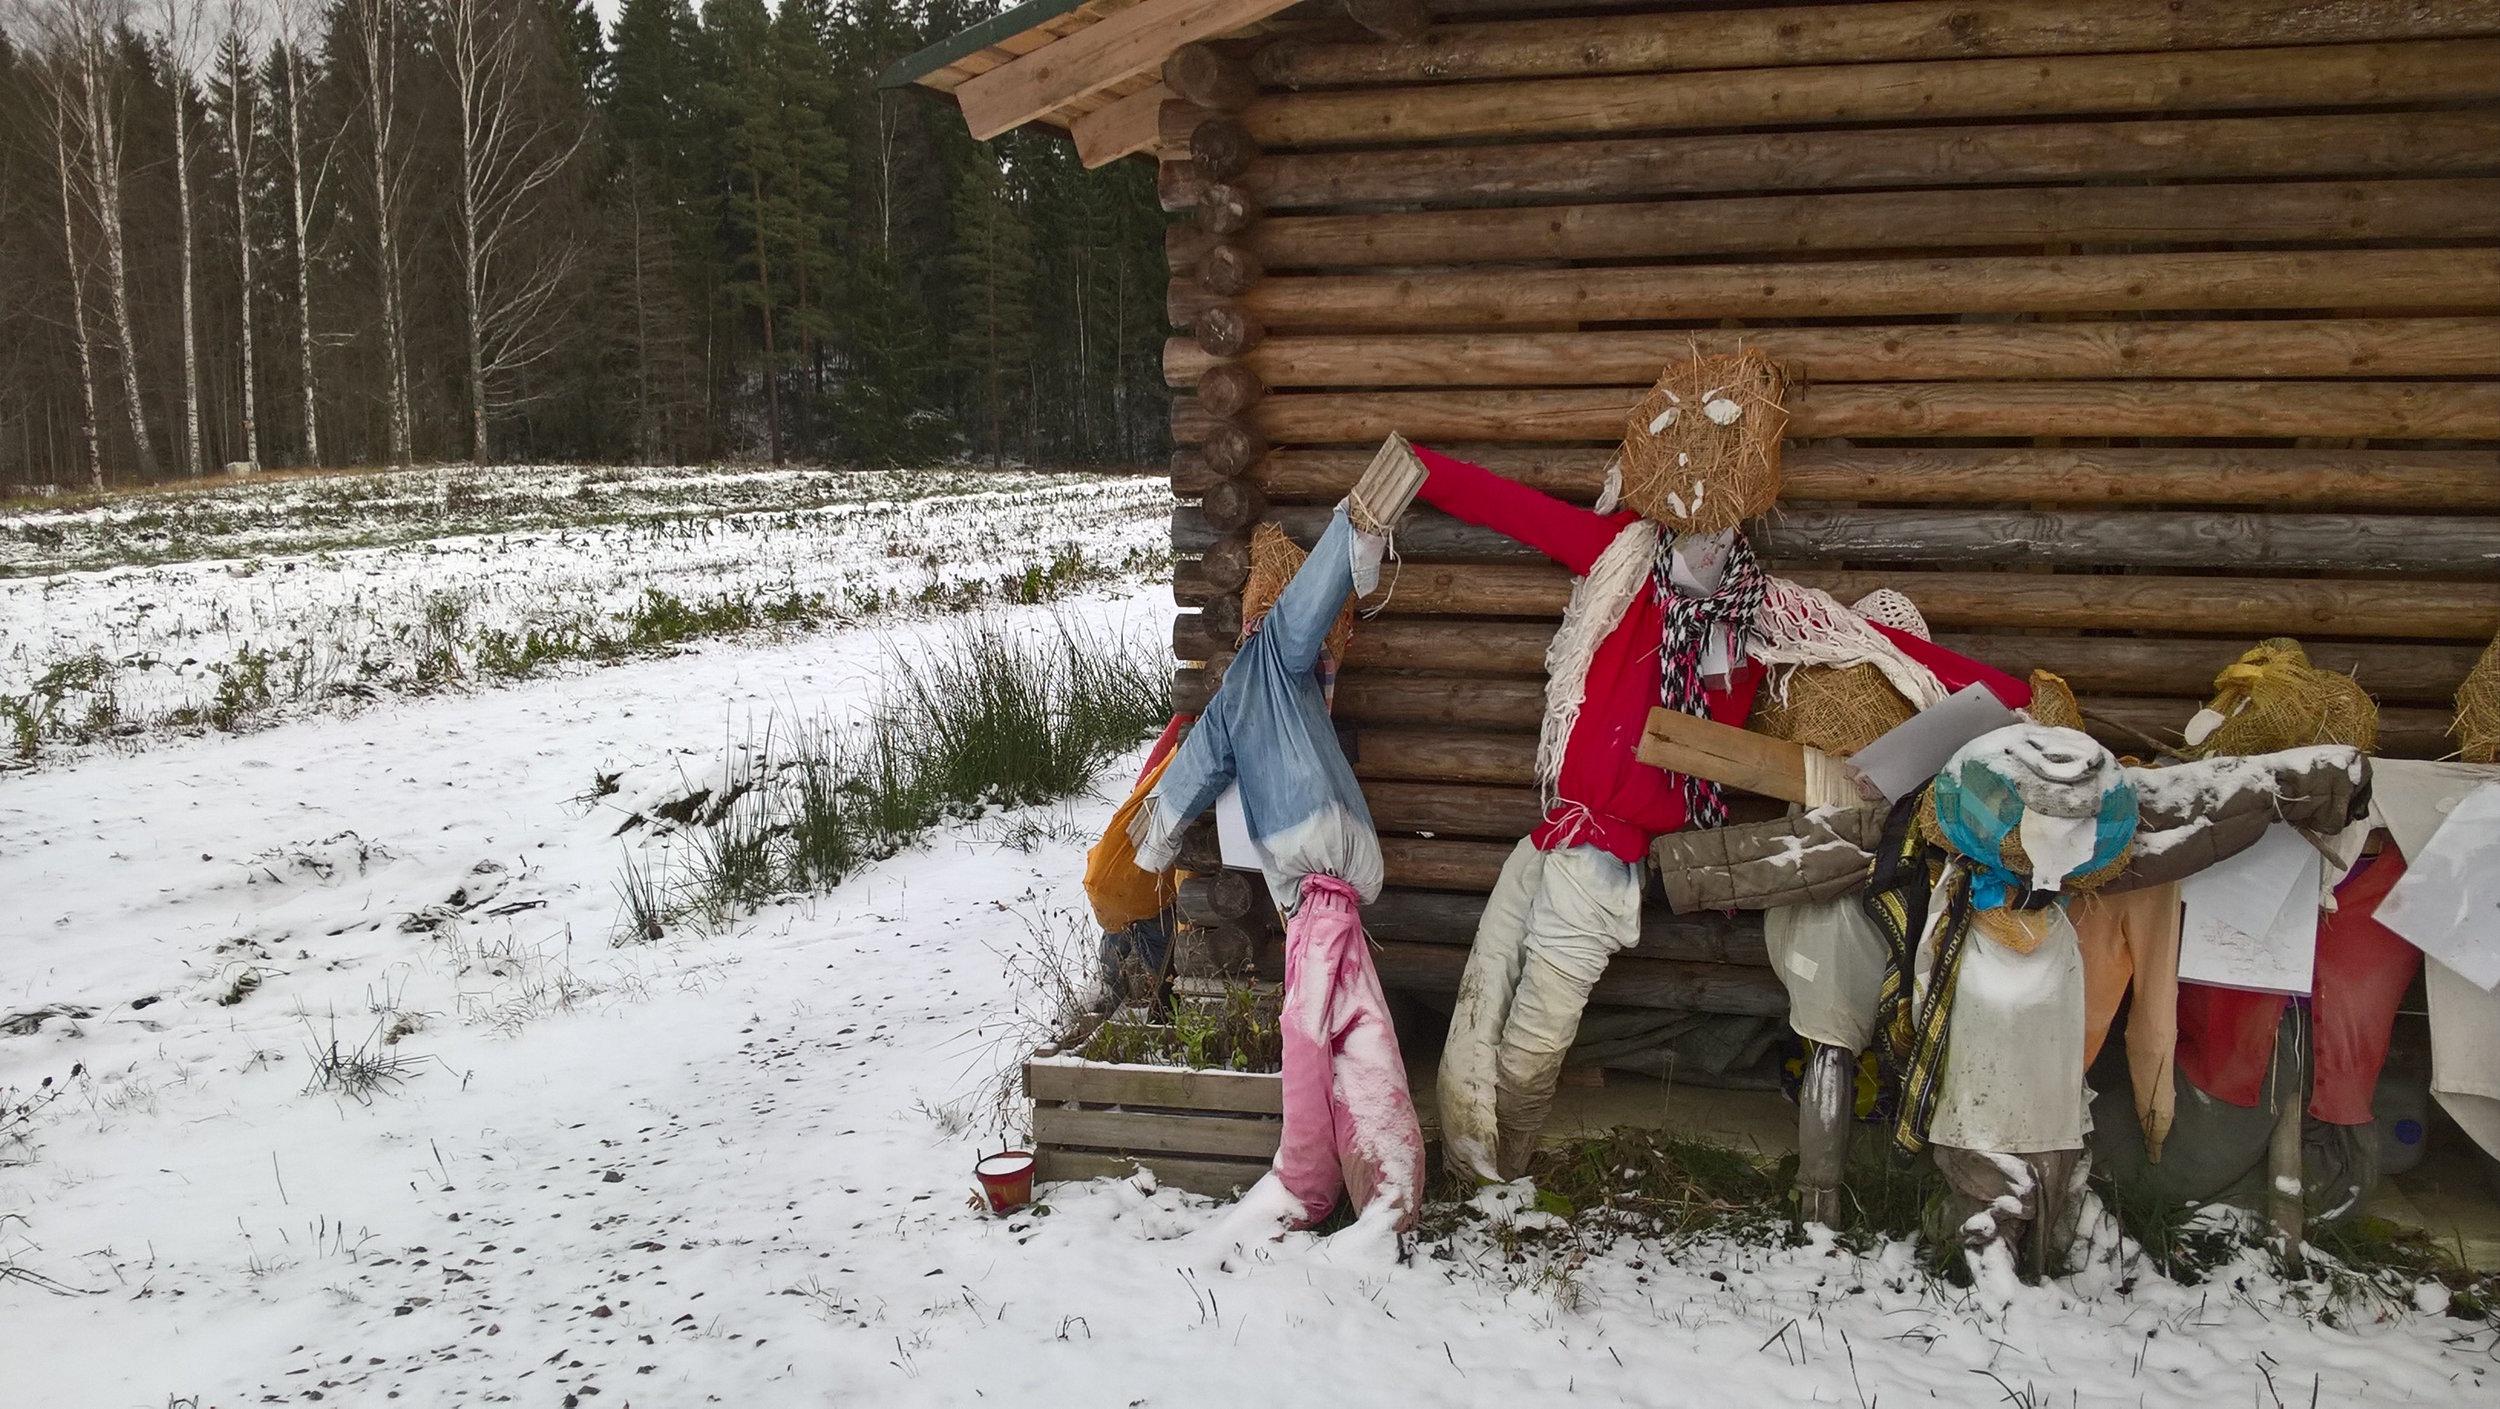 Luminen pelto & pelättimet